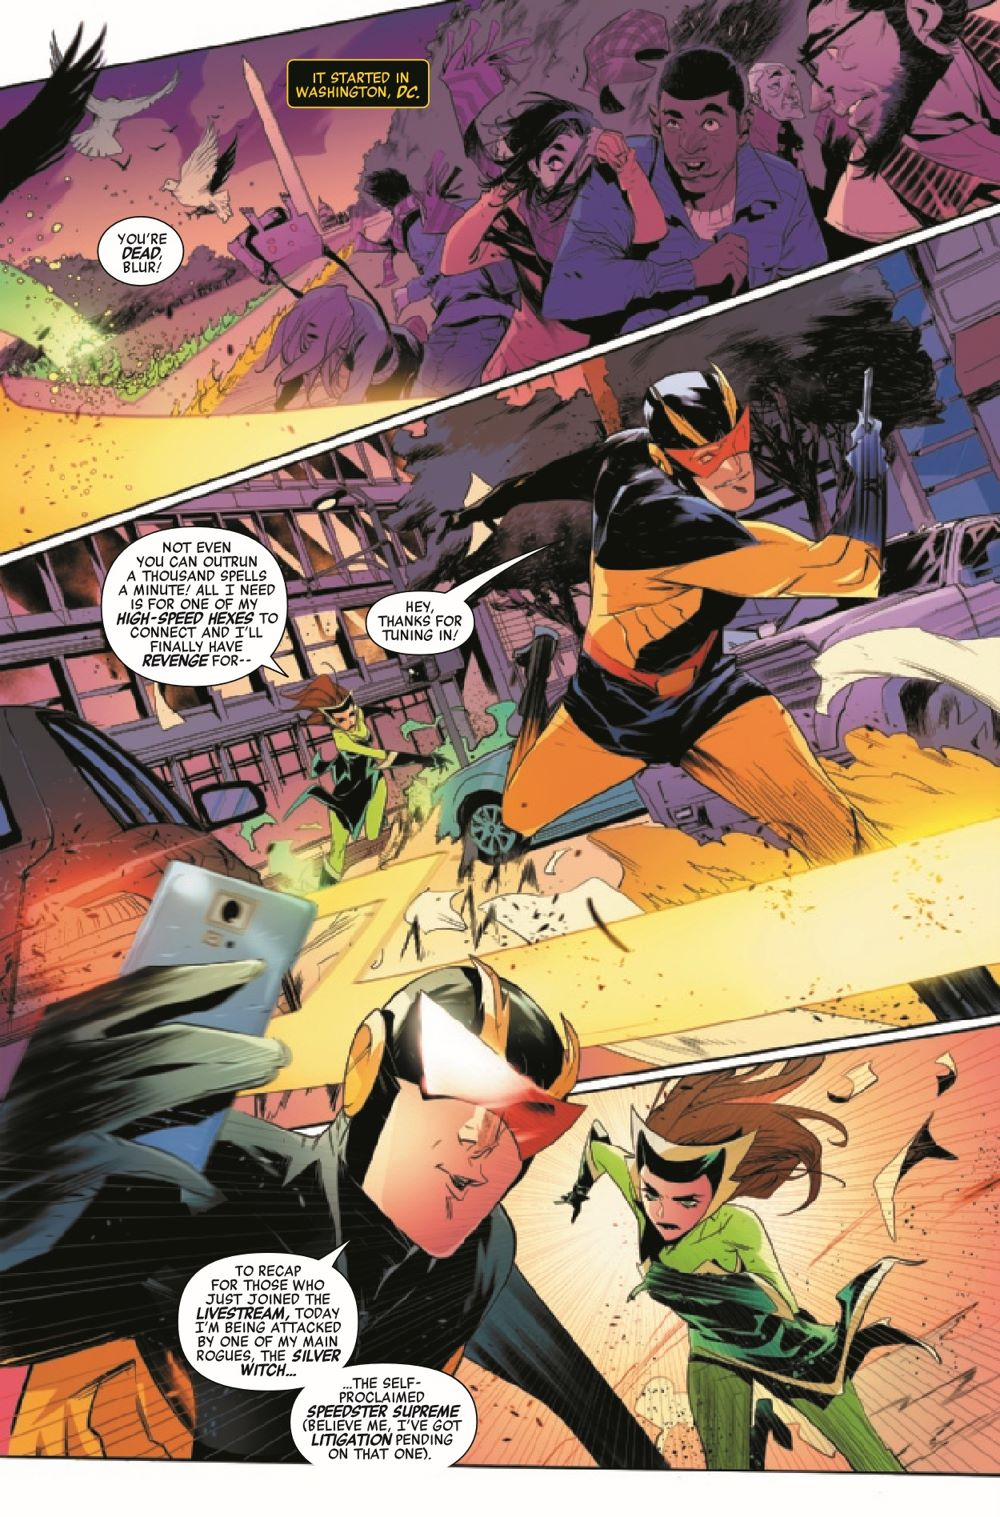 HEROESREBORN2021003_Preview-4 ComicList Previews: HEROES REBORN #3 (OF 7)